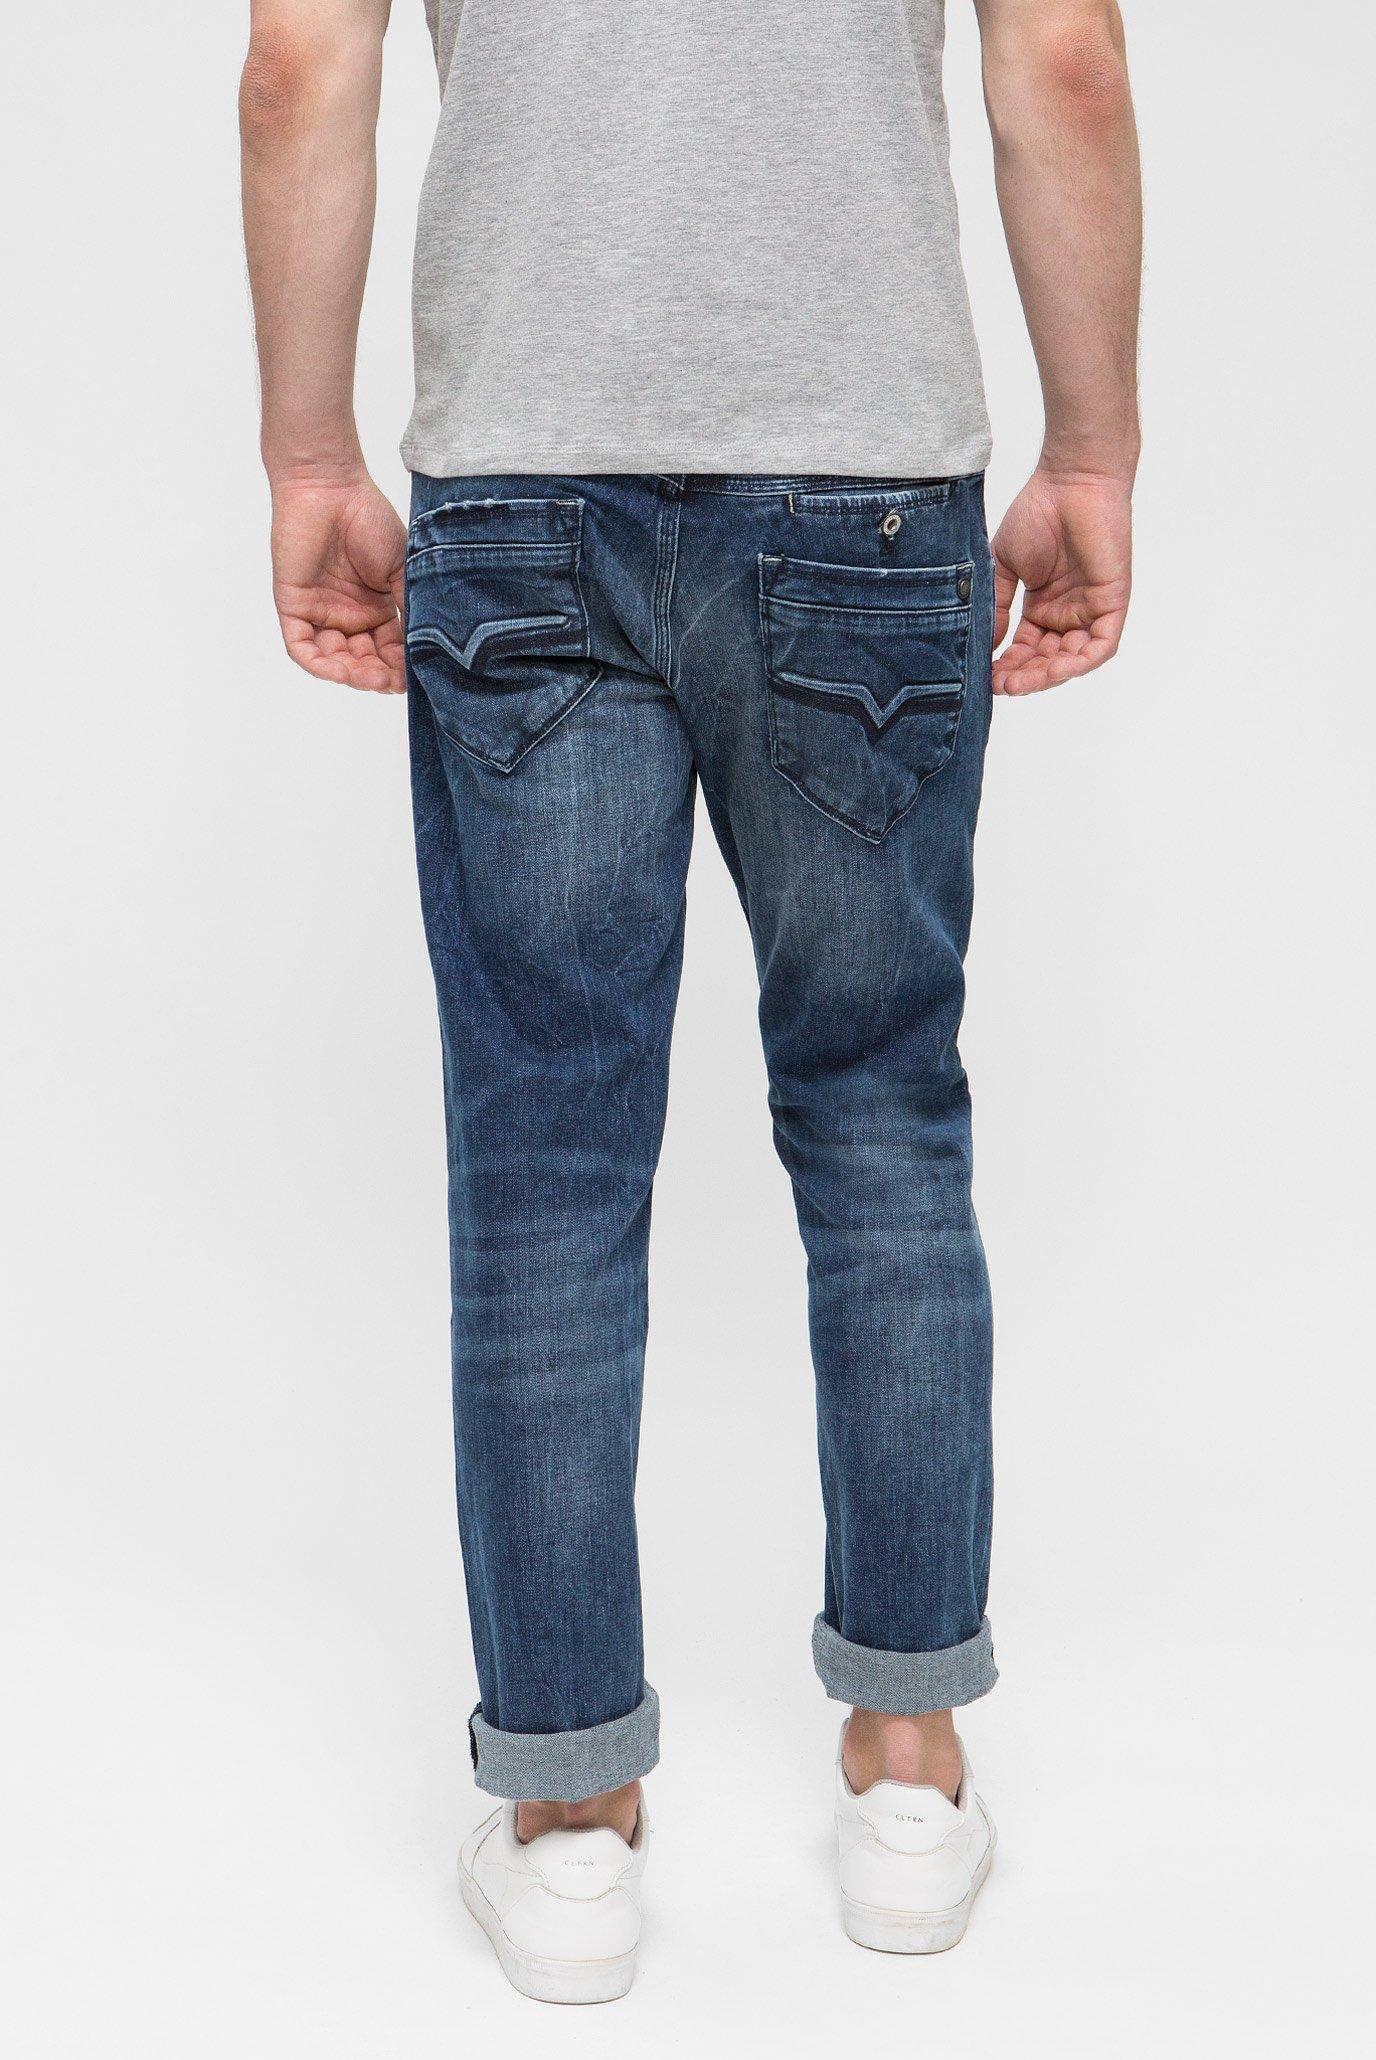 Купить Мужские темно-синие джинсы SPIKE Pepe Jeans Pepe Jeans PM200029CH12 – Киев, Украина. Цены в интернет магазине MD Fashion